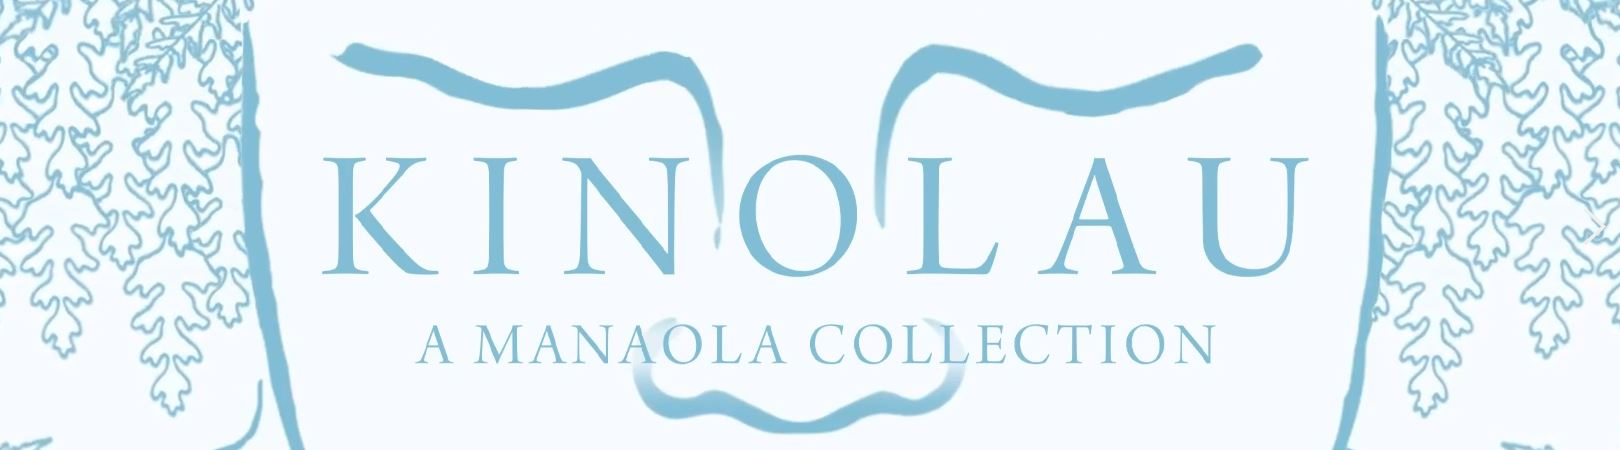 "Kinolau ""A Manaloa Collection"" Blue Banner"